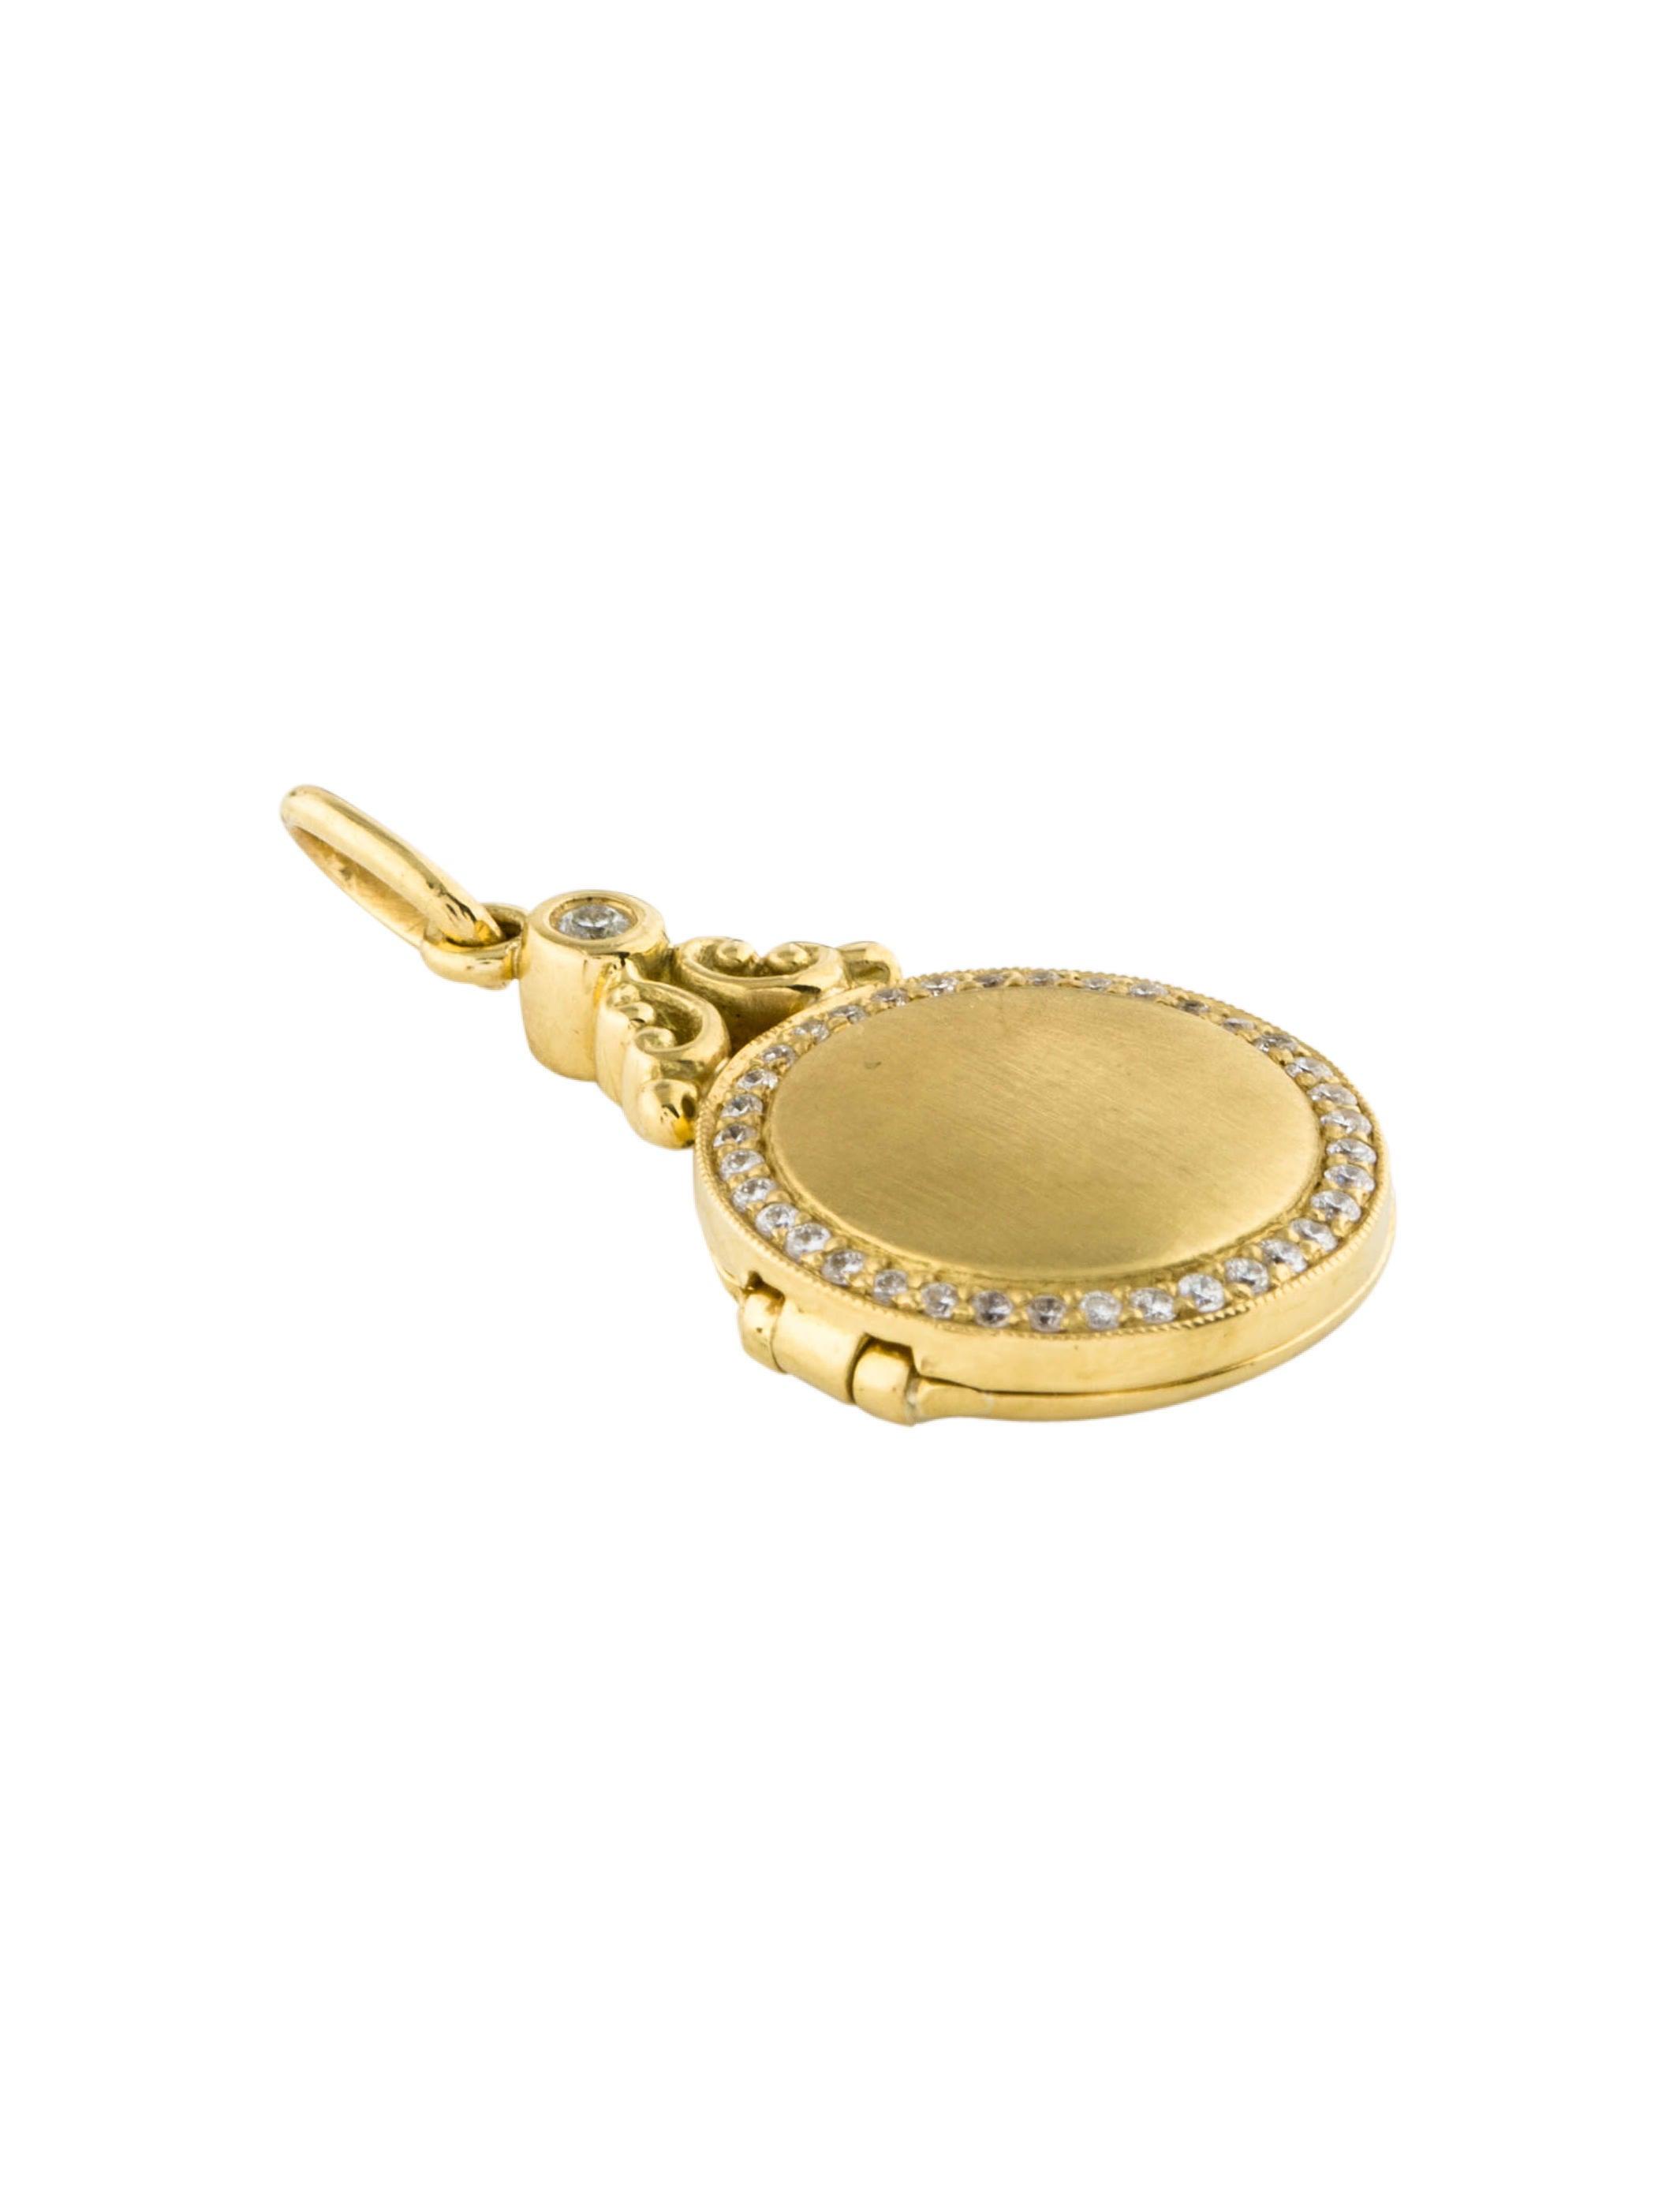 Penny preville 18k diamond locket pendant necklaces ppv20452 18k diamond locket pendant aloadofball Image collections